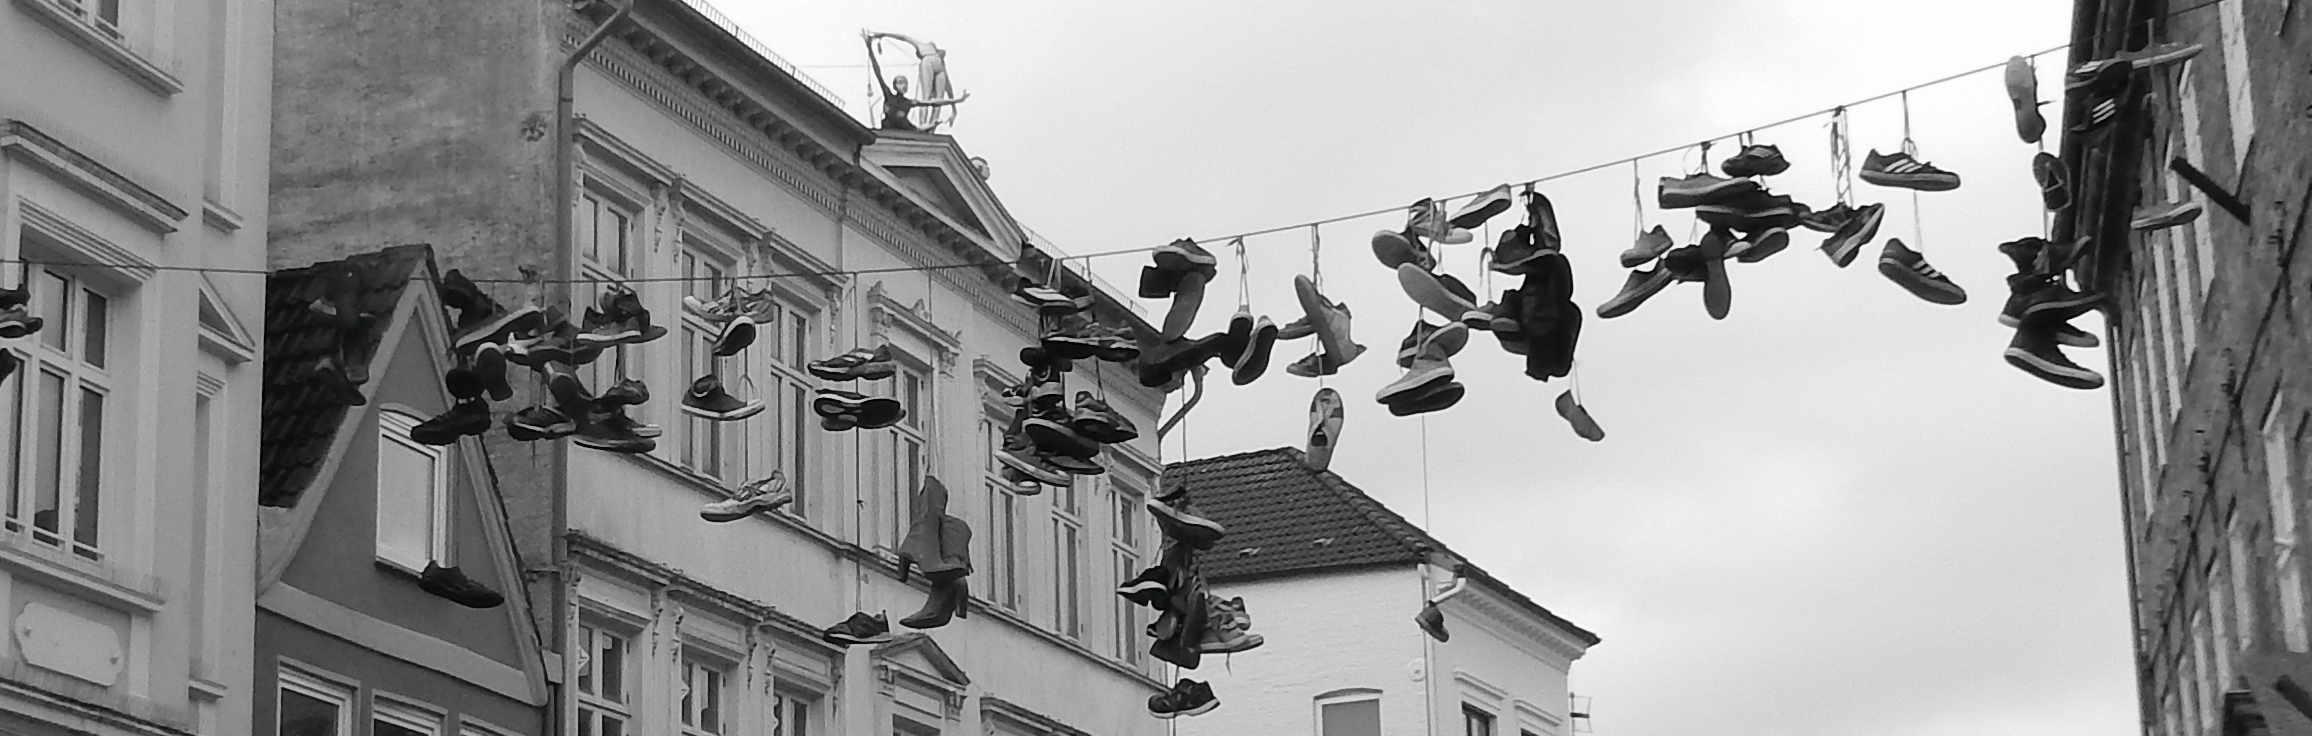 sneakers strange